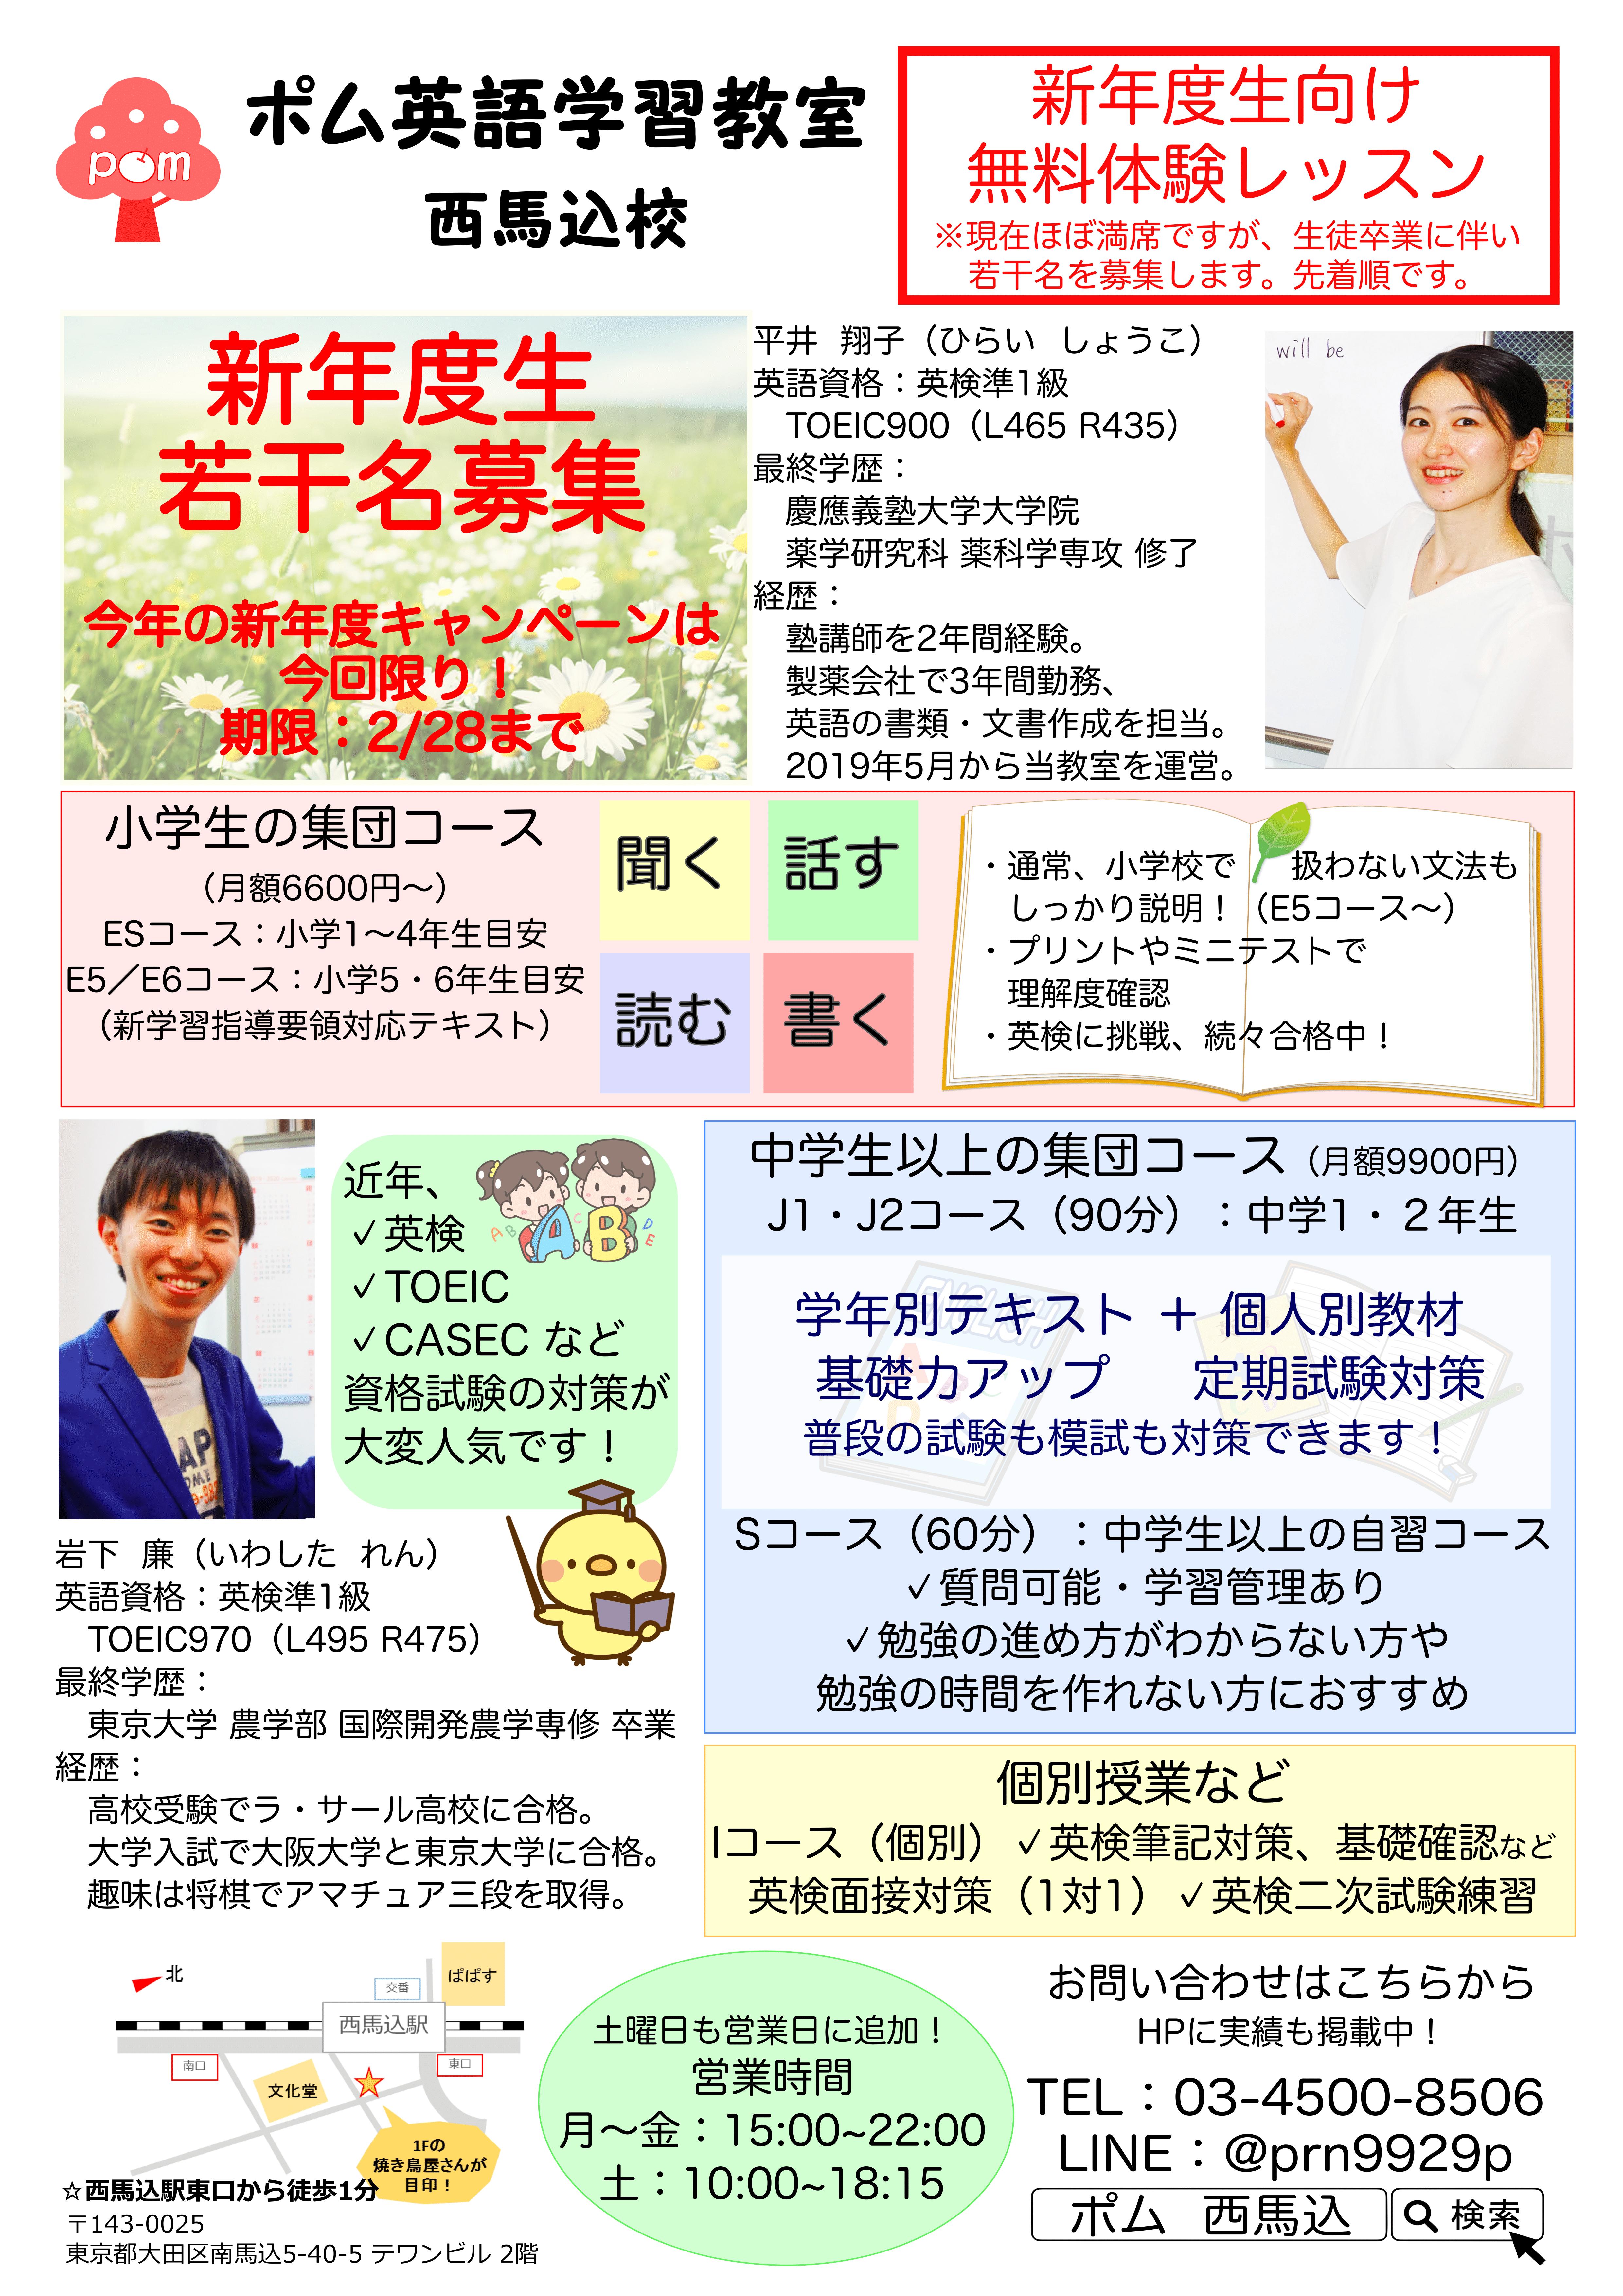 202i-new-students